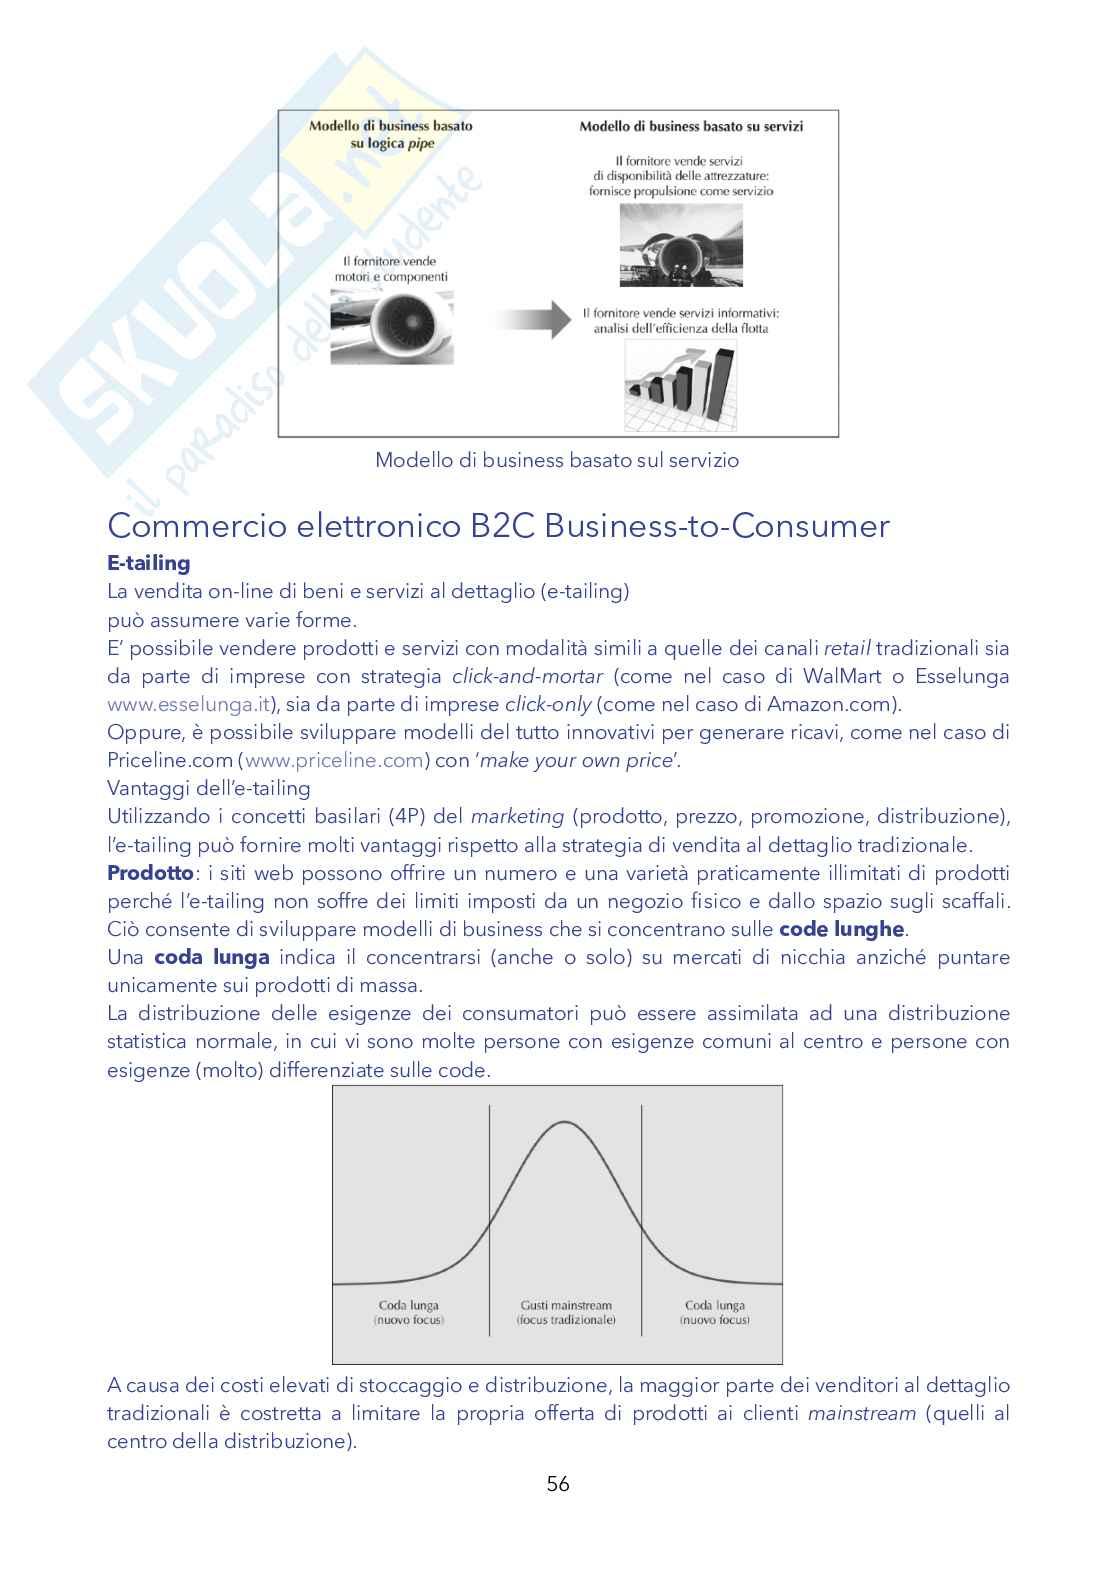 informatica 1 completo Pag. 56